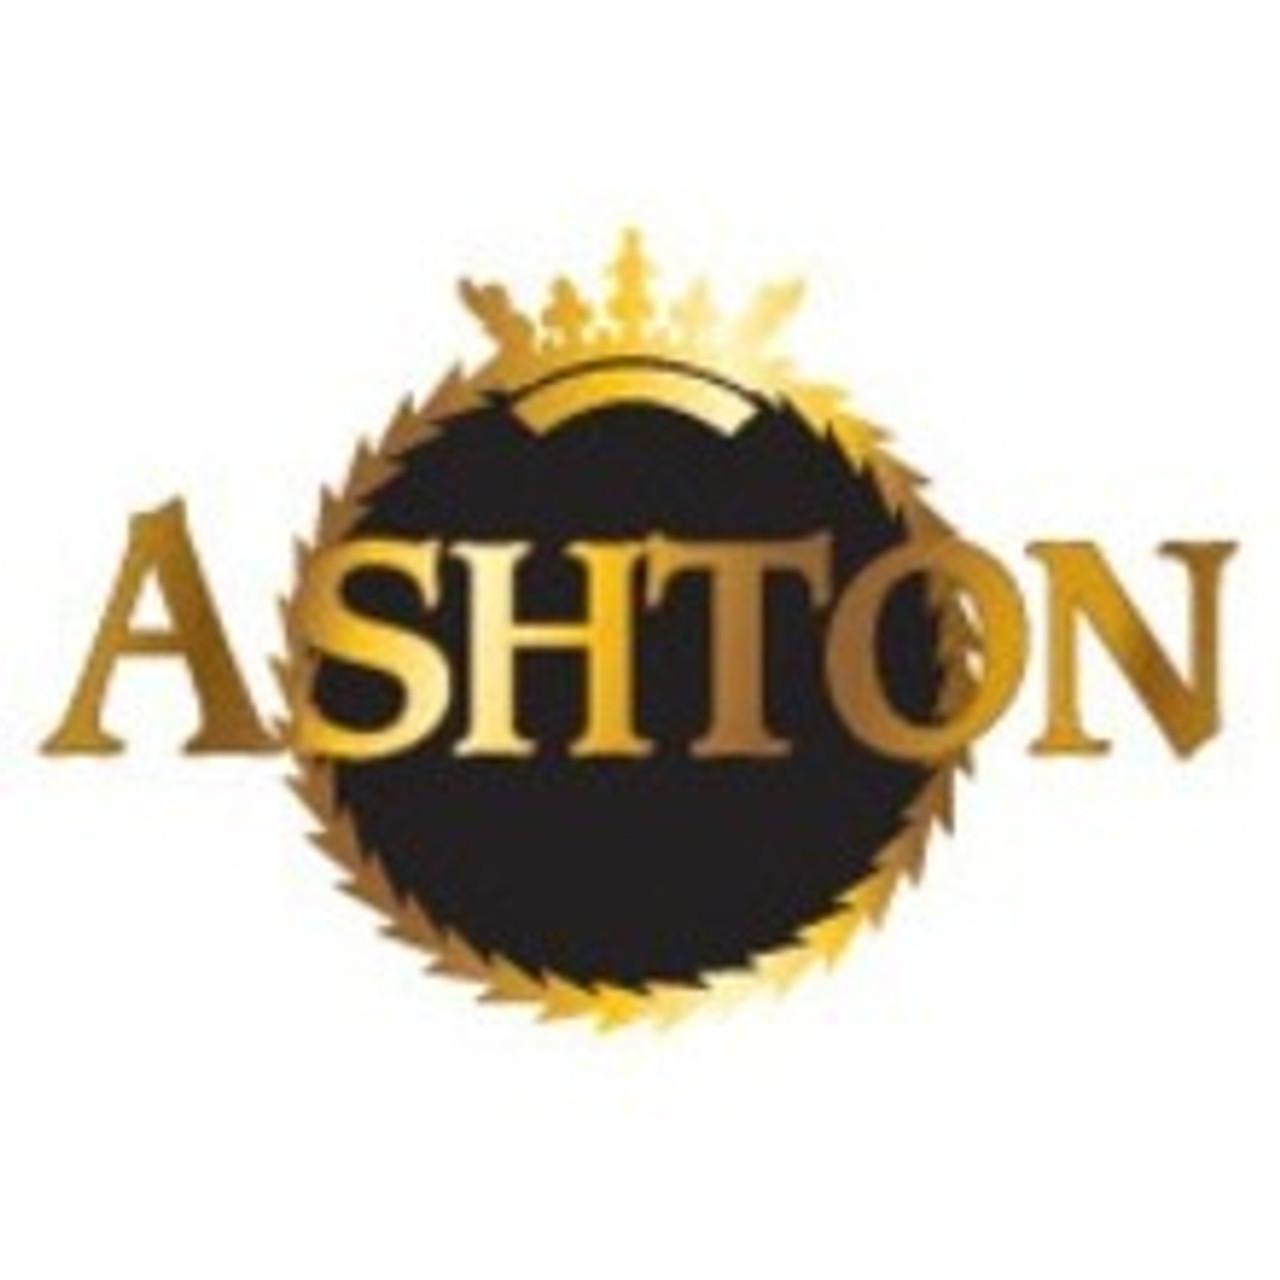 Ashton Senoritas Connecticut Cigars - 4.25 x 32 (10 Packs of 10 (100 total))